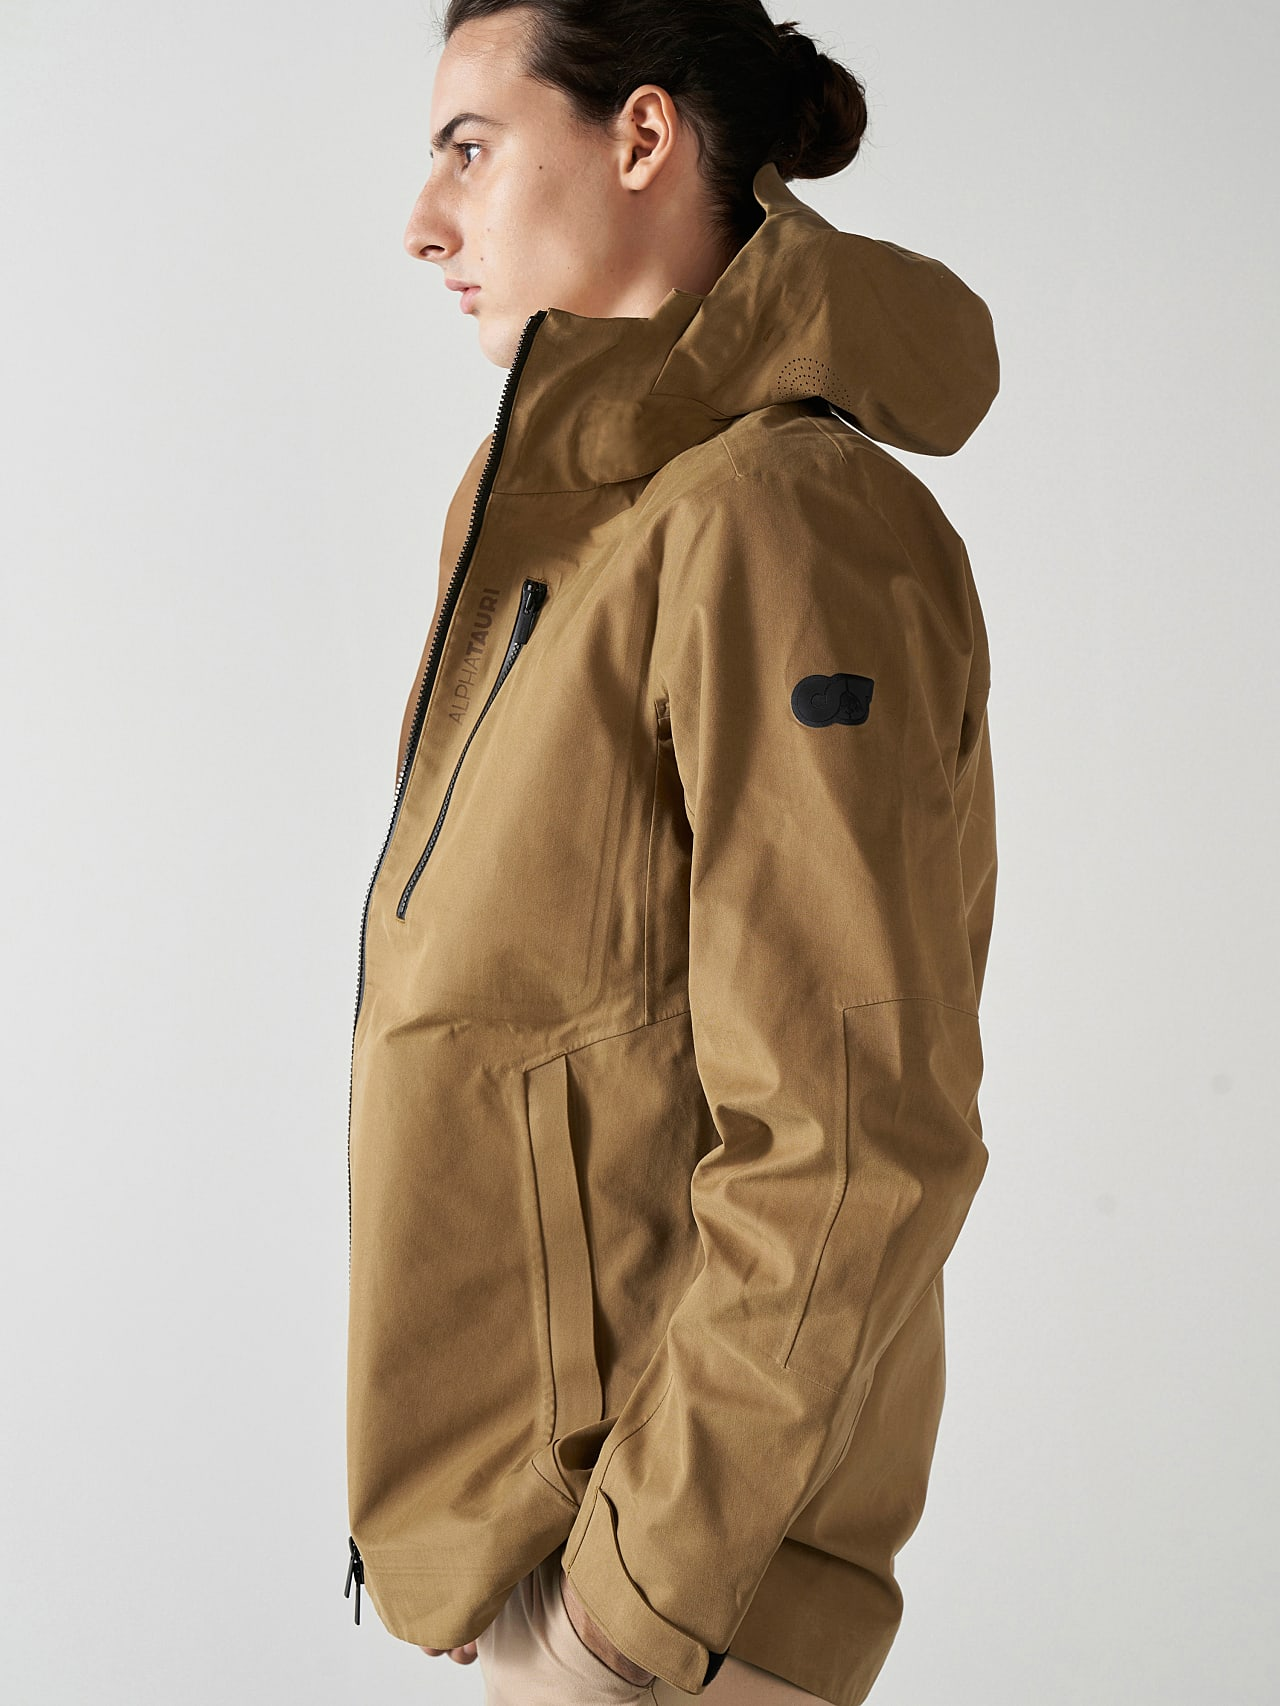 OKOVO V3.Y5.01 Packable Waterproof Jacket brown Model shot Alpha Tauri